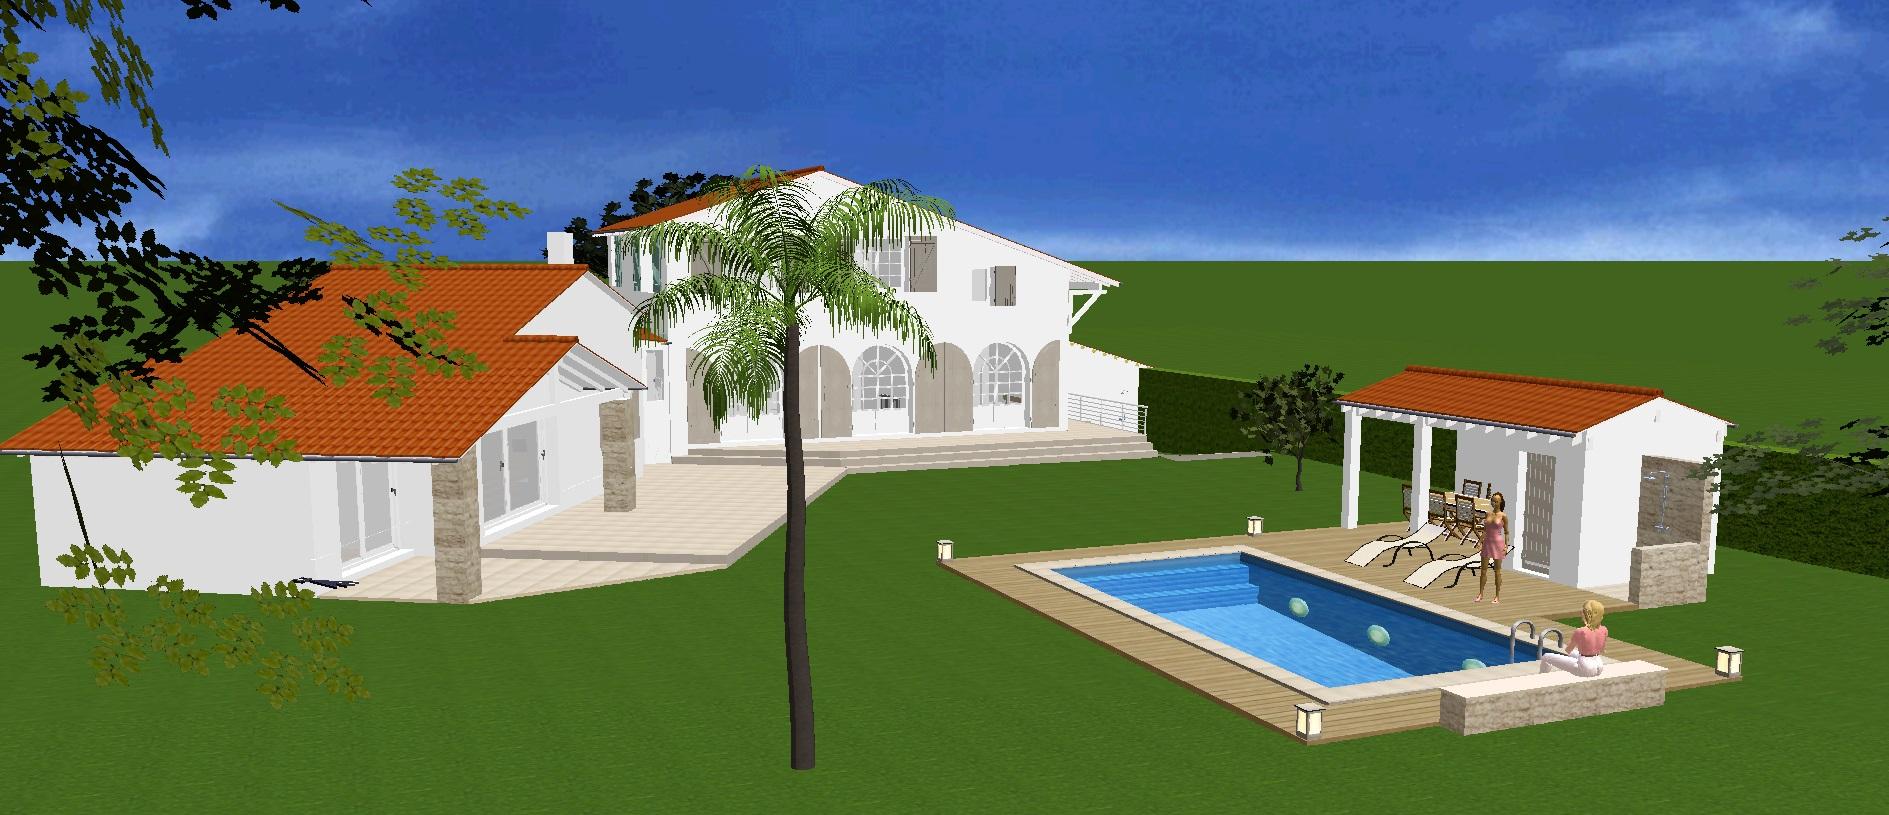 Projet 7 piscine